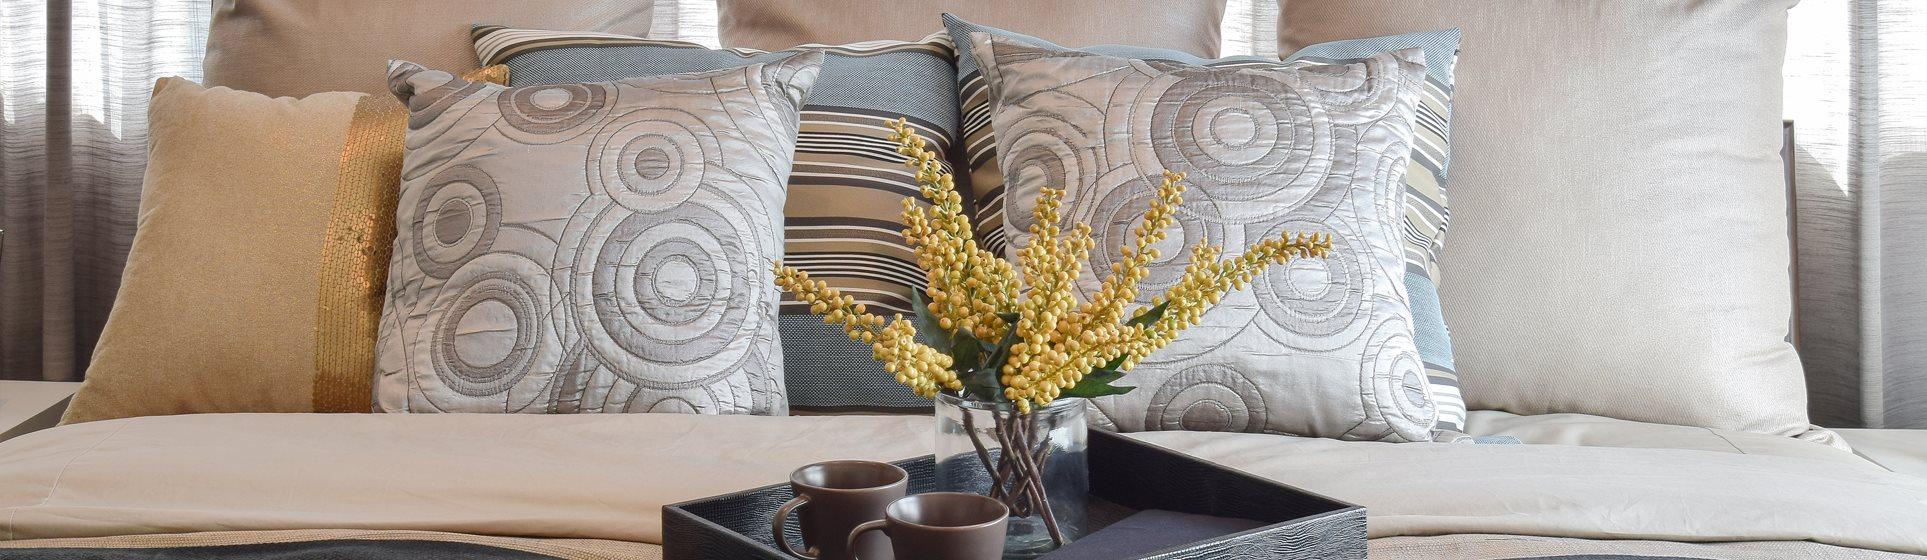 1500 Locust luxury apartment bedroom pillows